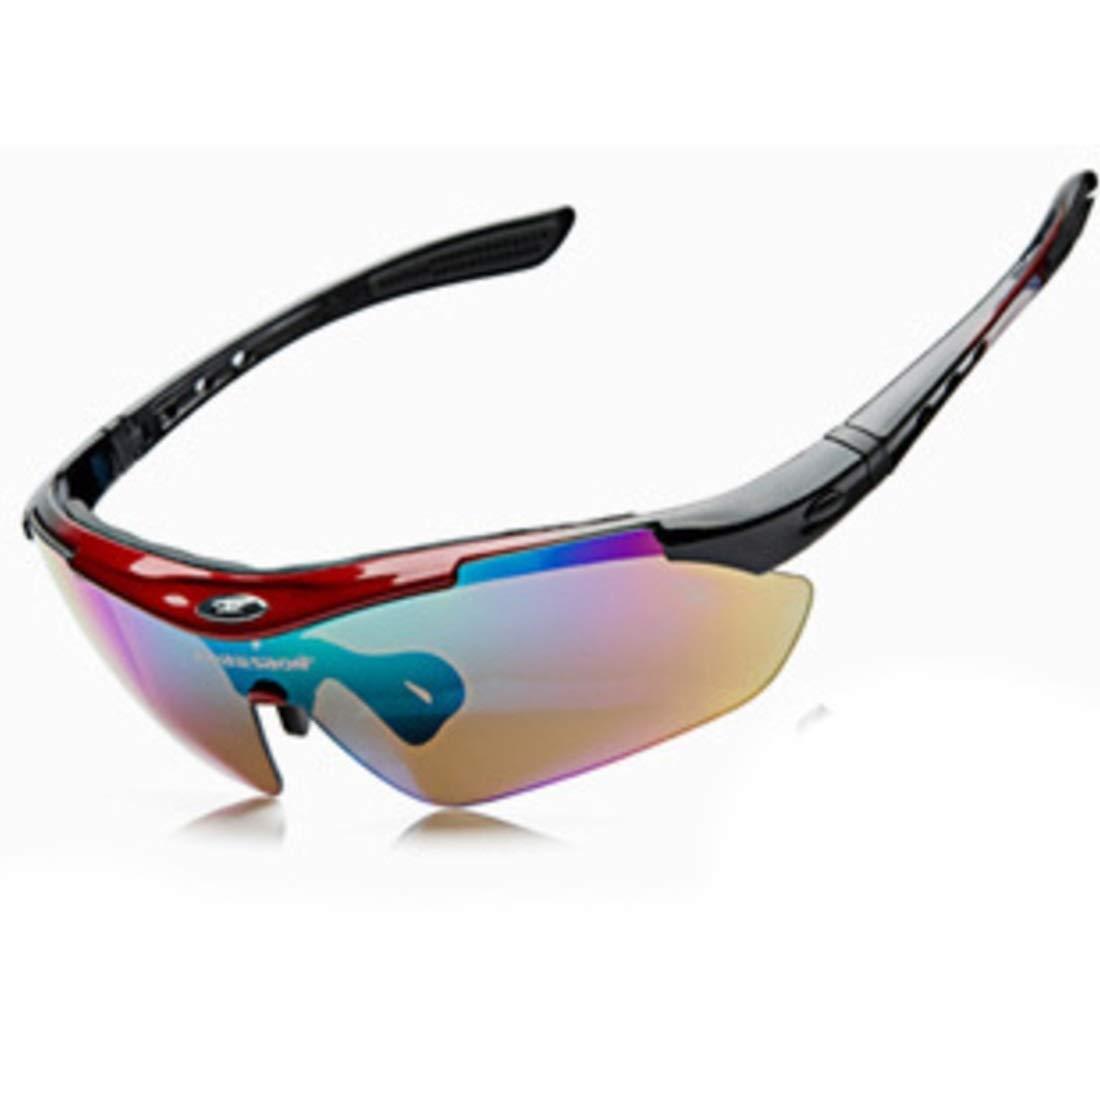 BAOYIT Polarized Goggles Riding Outdoor Polarized Riding Glasses Outdoor Sports Goggles for Women Men (Color : Black) by BAOYIT